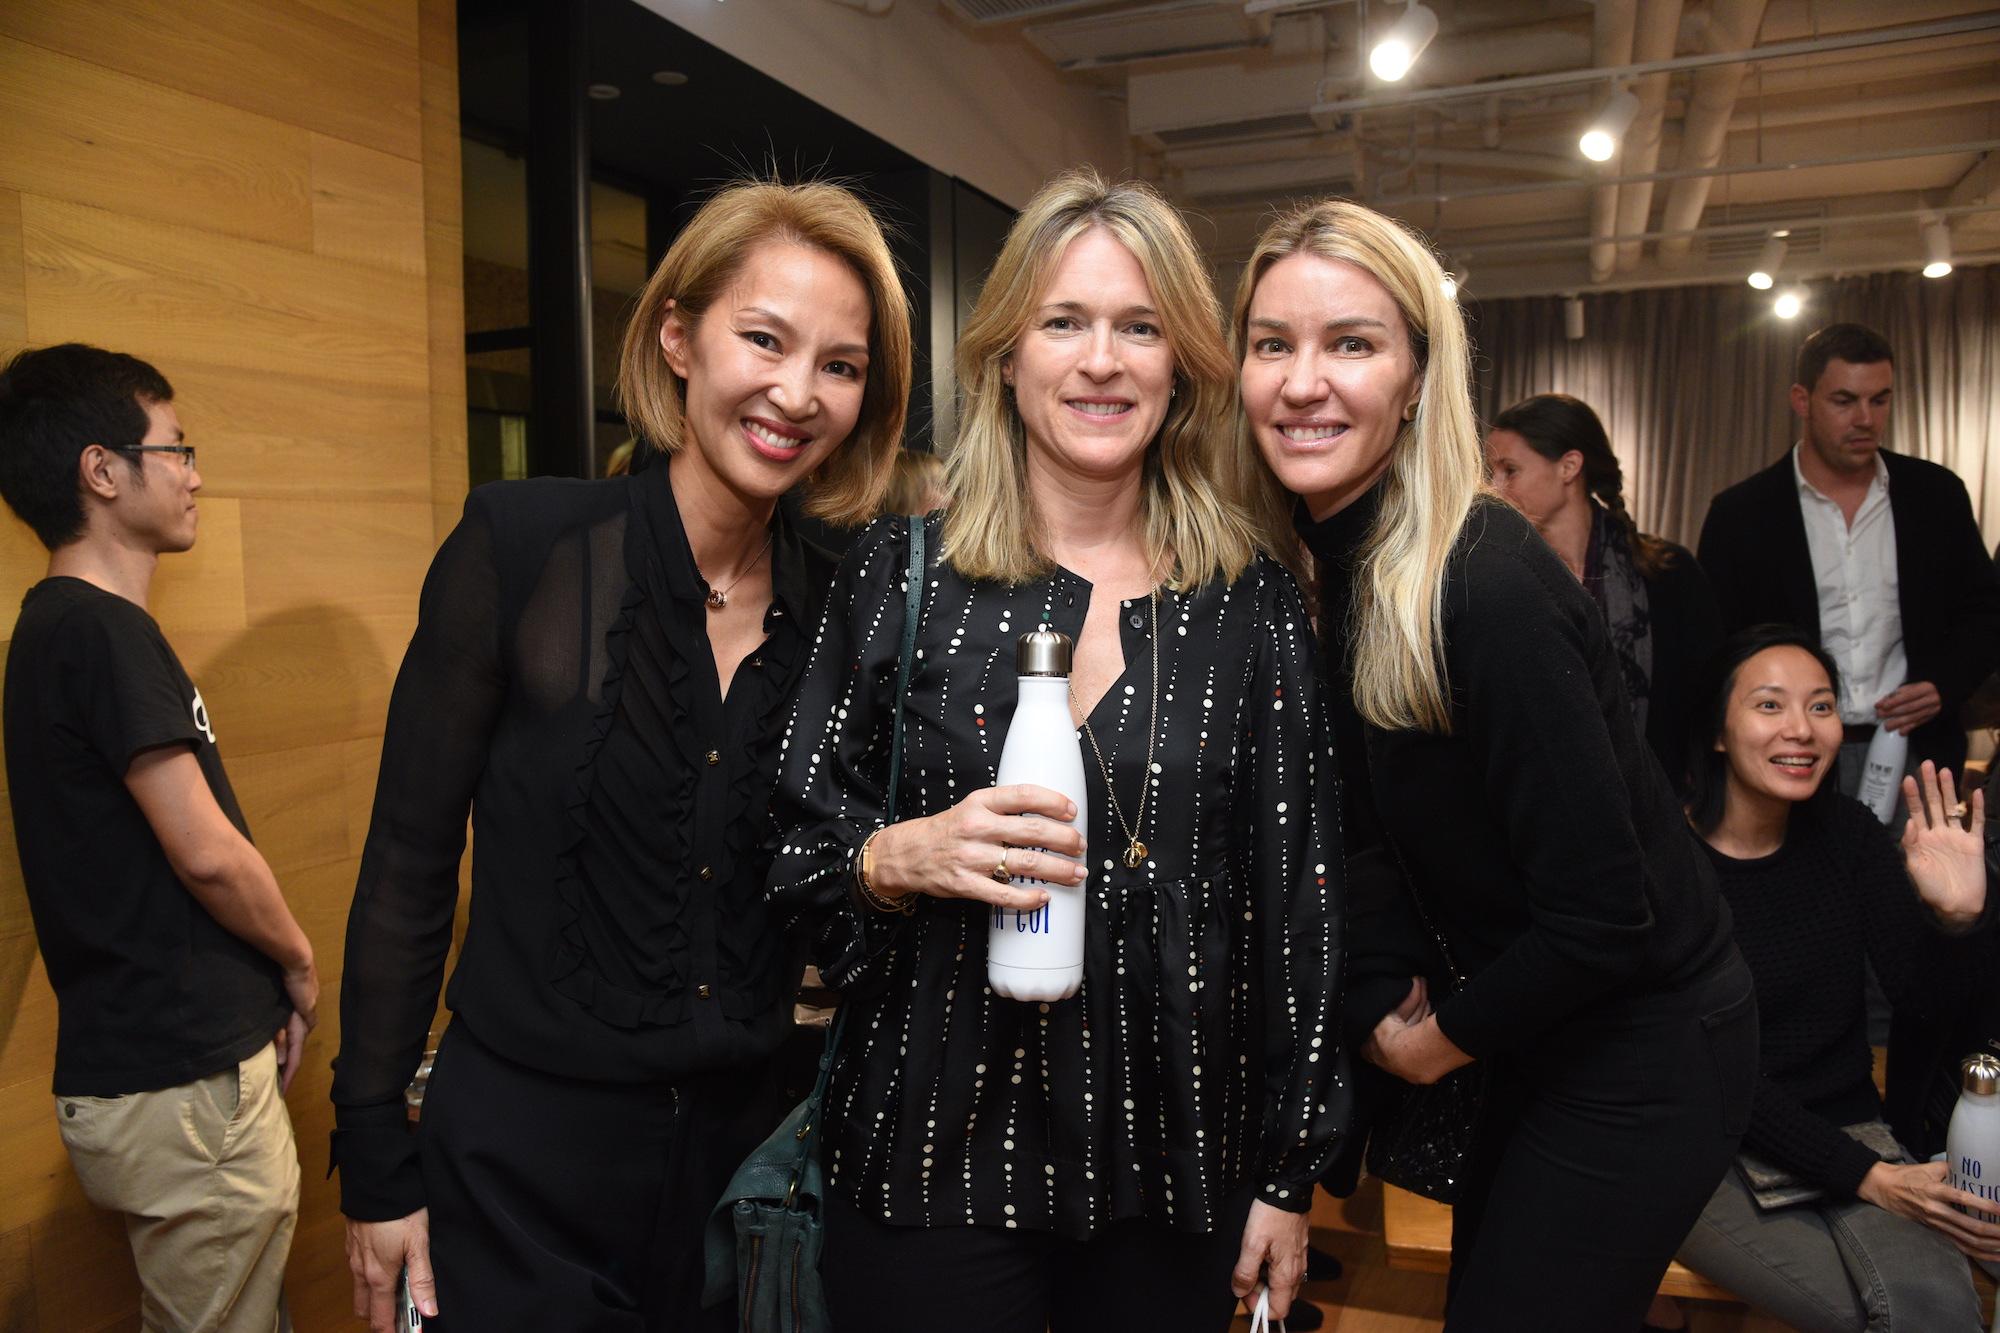 Yolanda Choy-Tang, Martha Keswick, Lucy Bond-Marriott